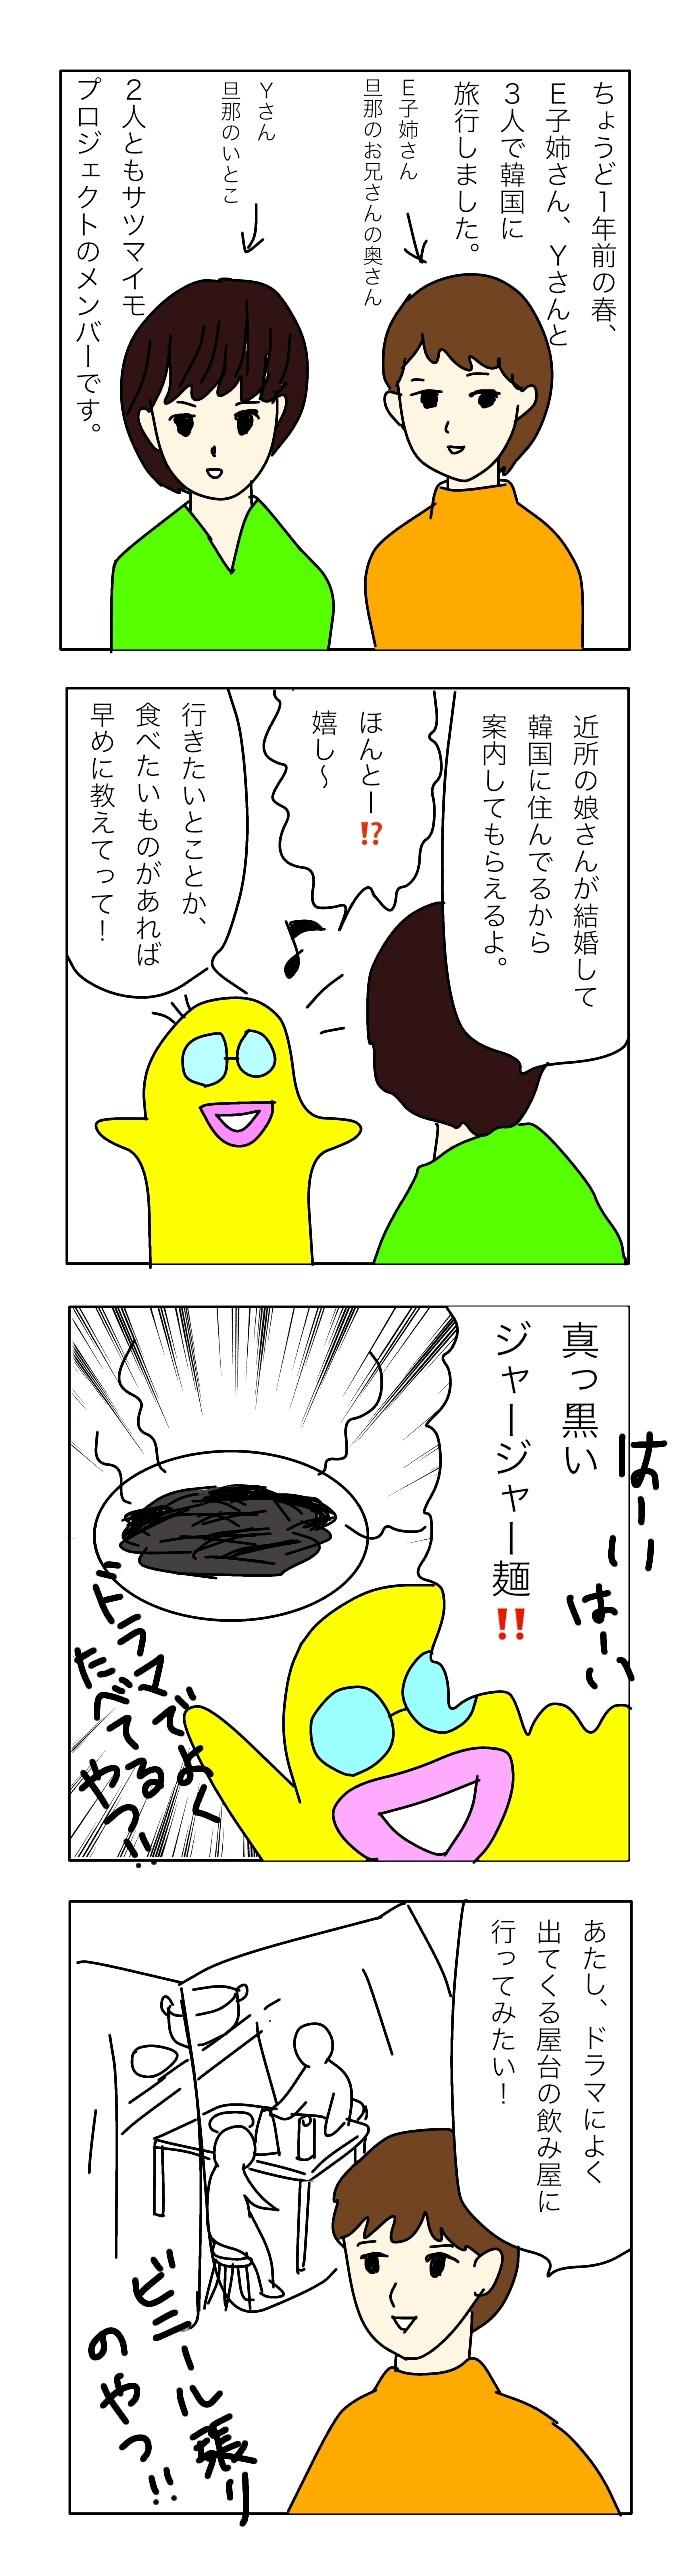 kankoku1 出発前1